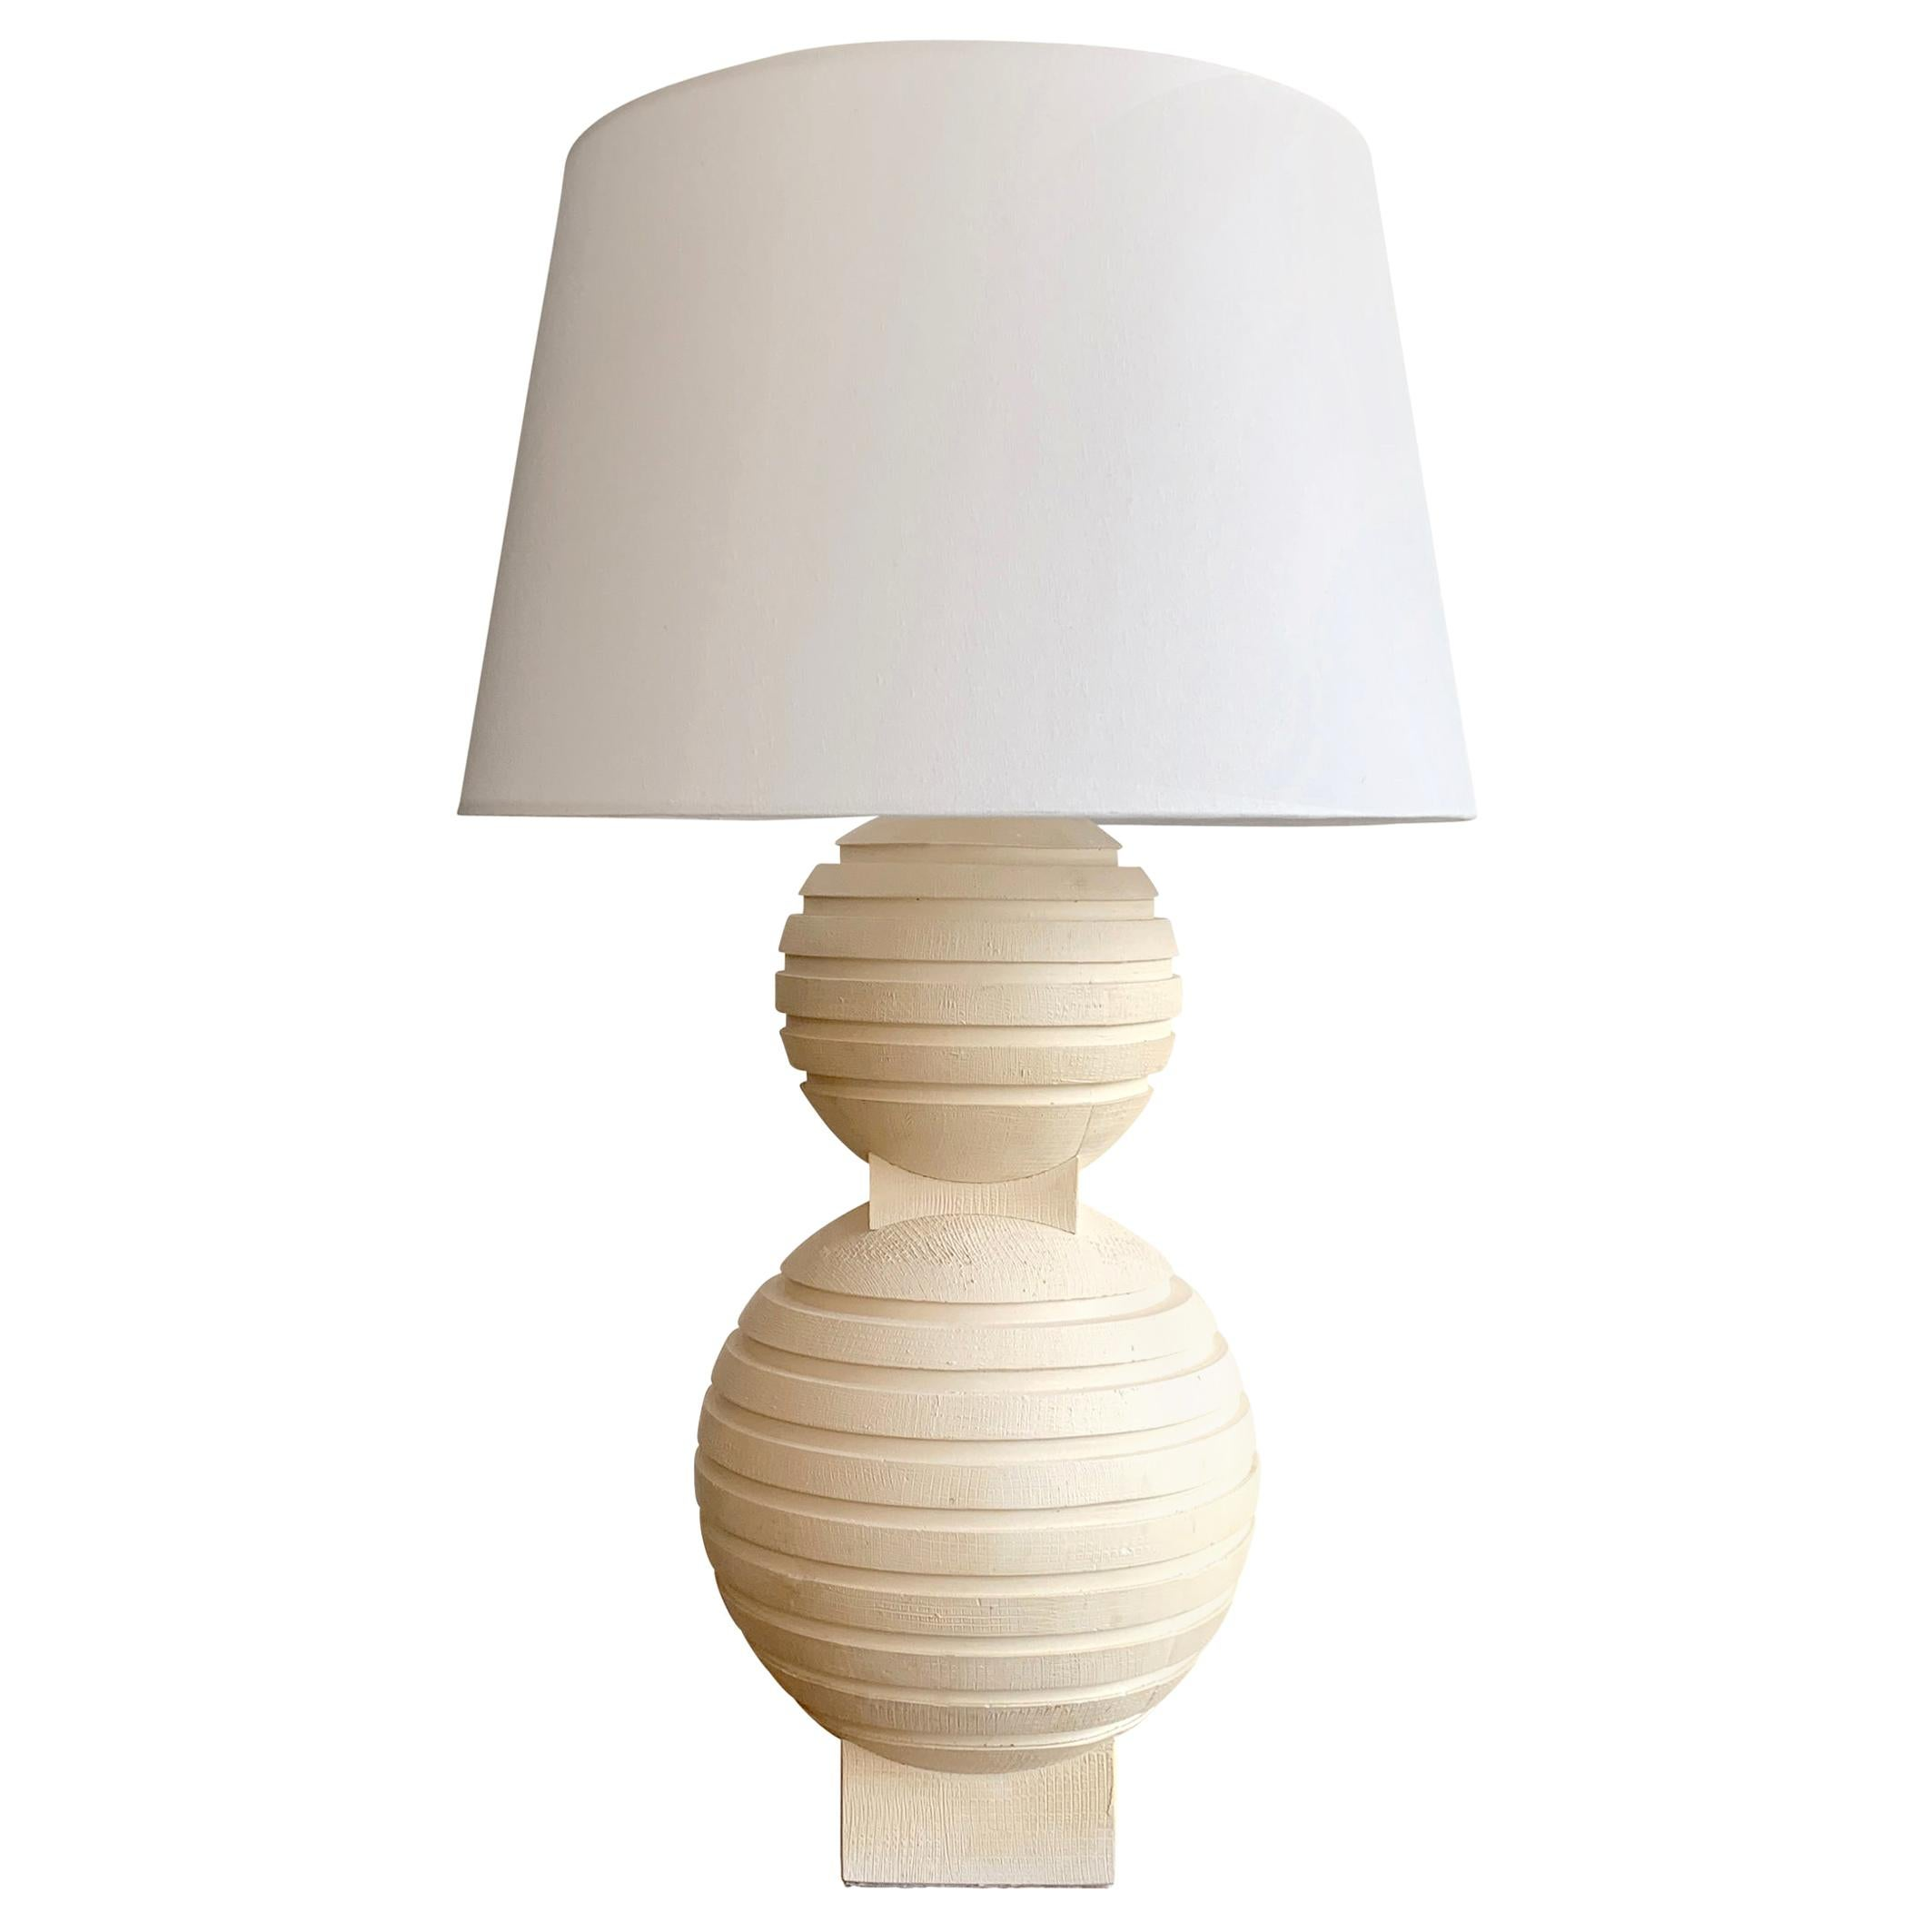 Sculptural Plaster Table Lamp